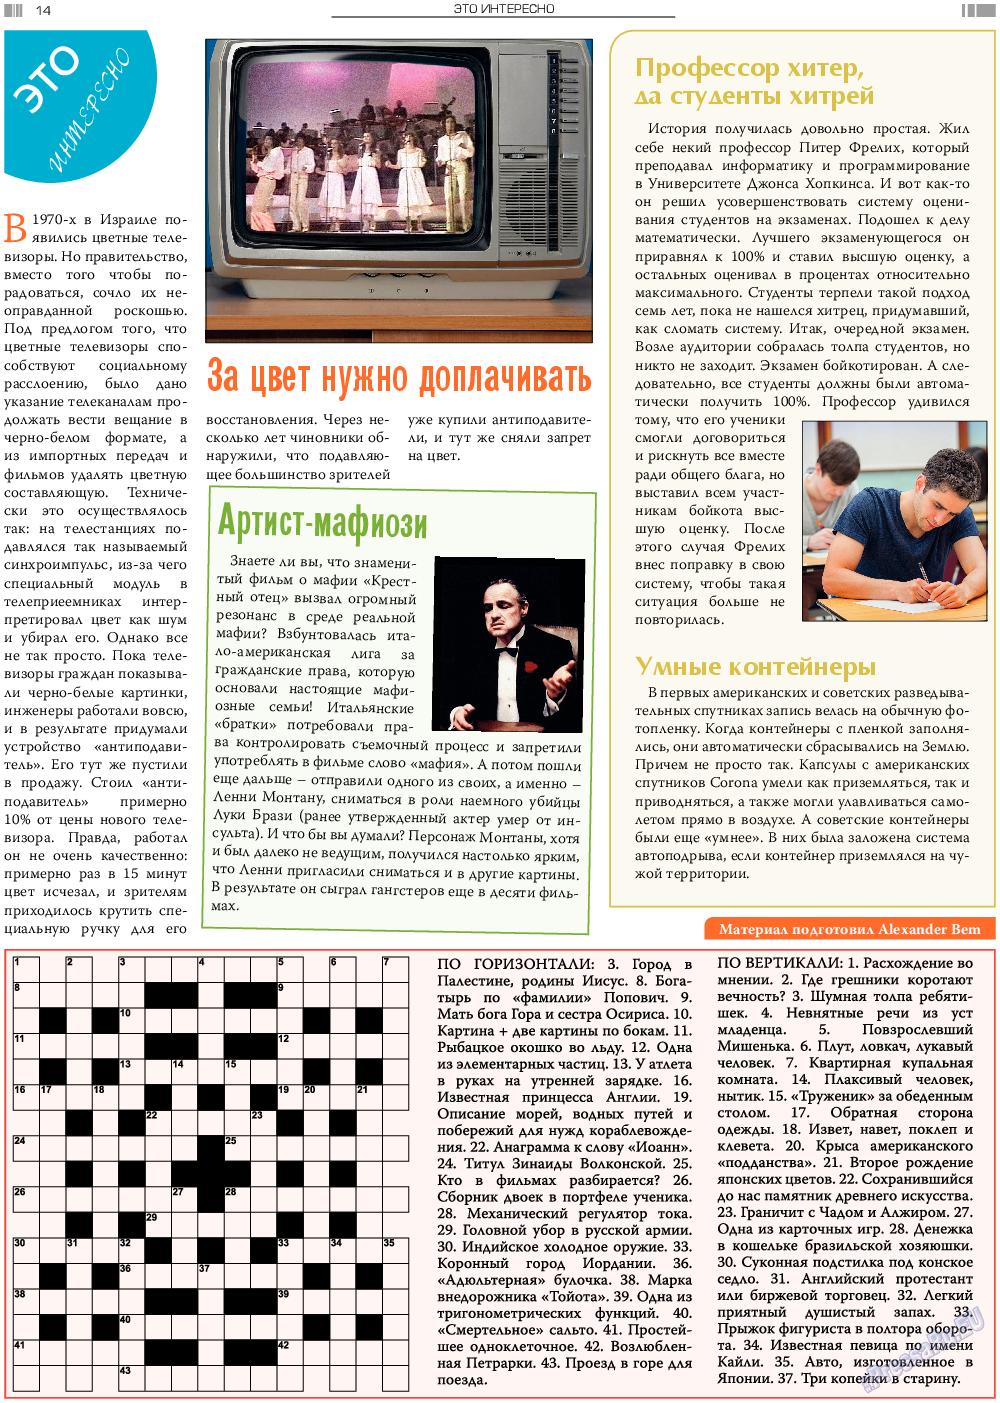 Анонс (газета). 2018 год, номер 10, стр. 14